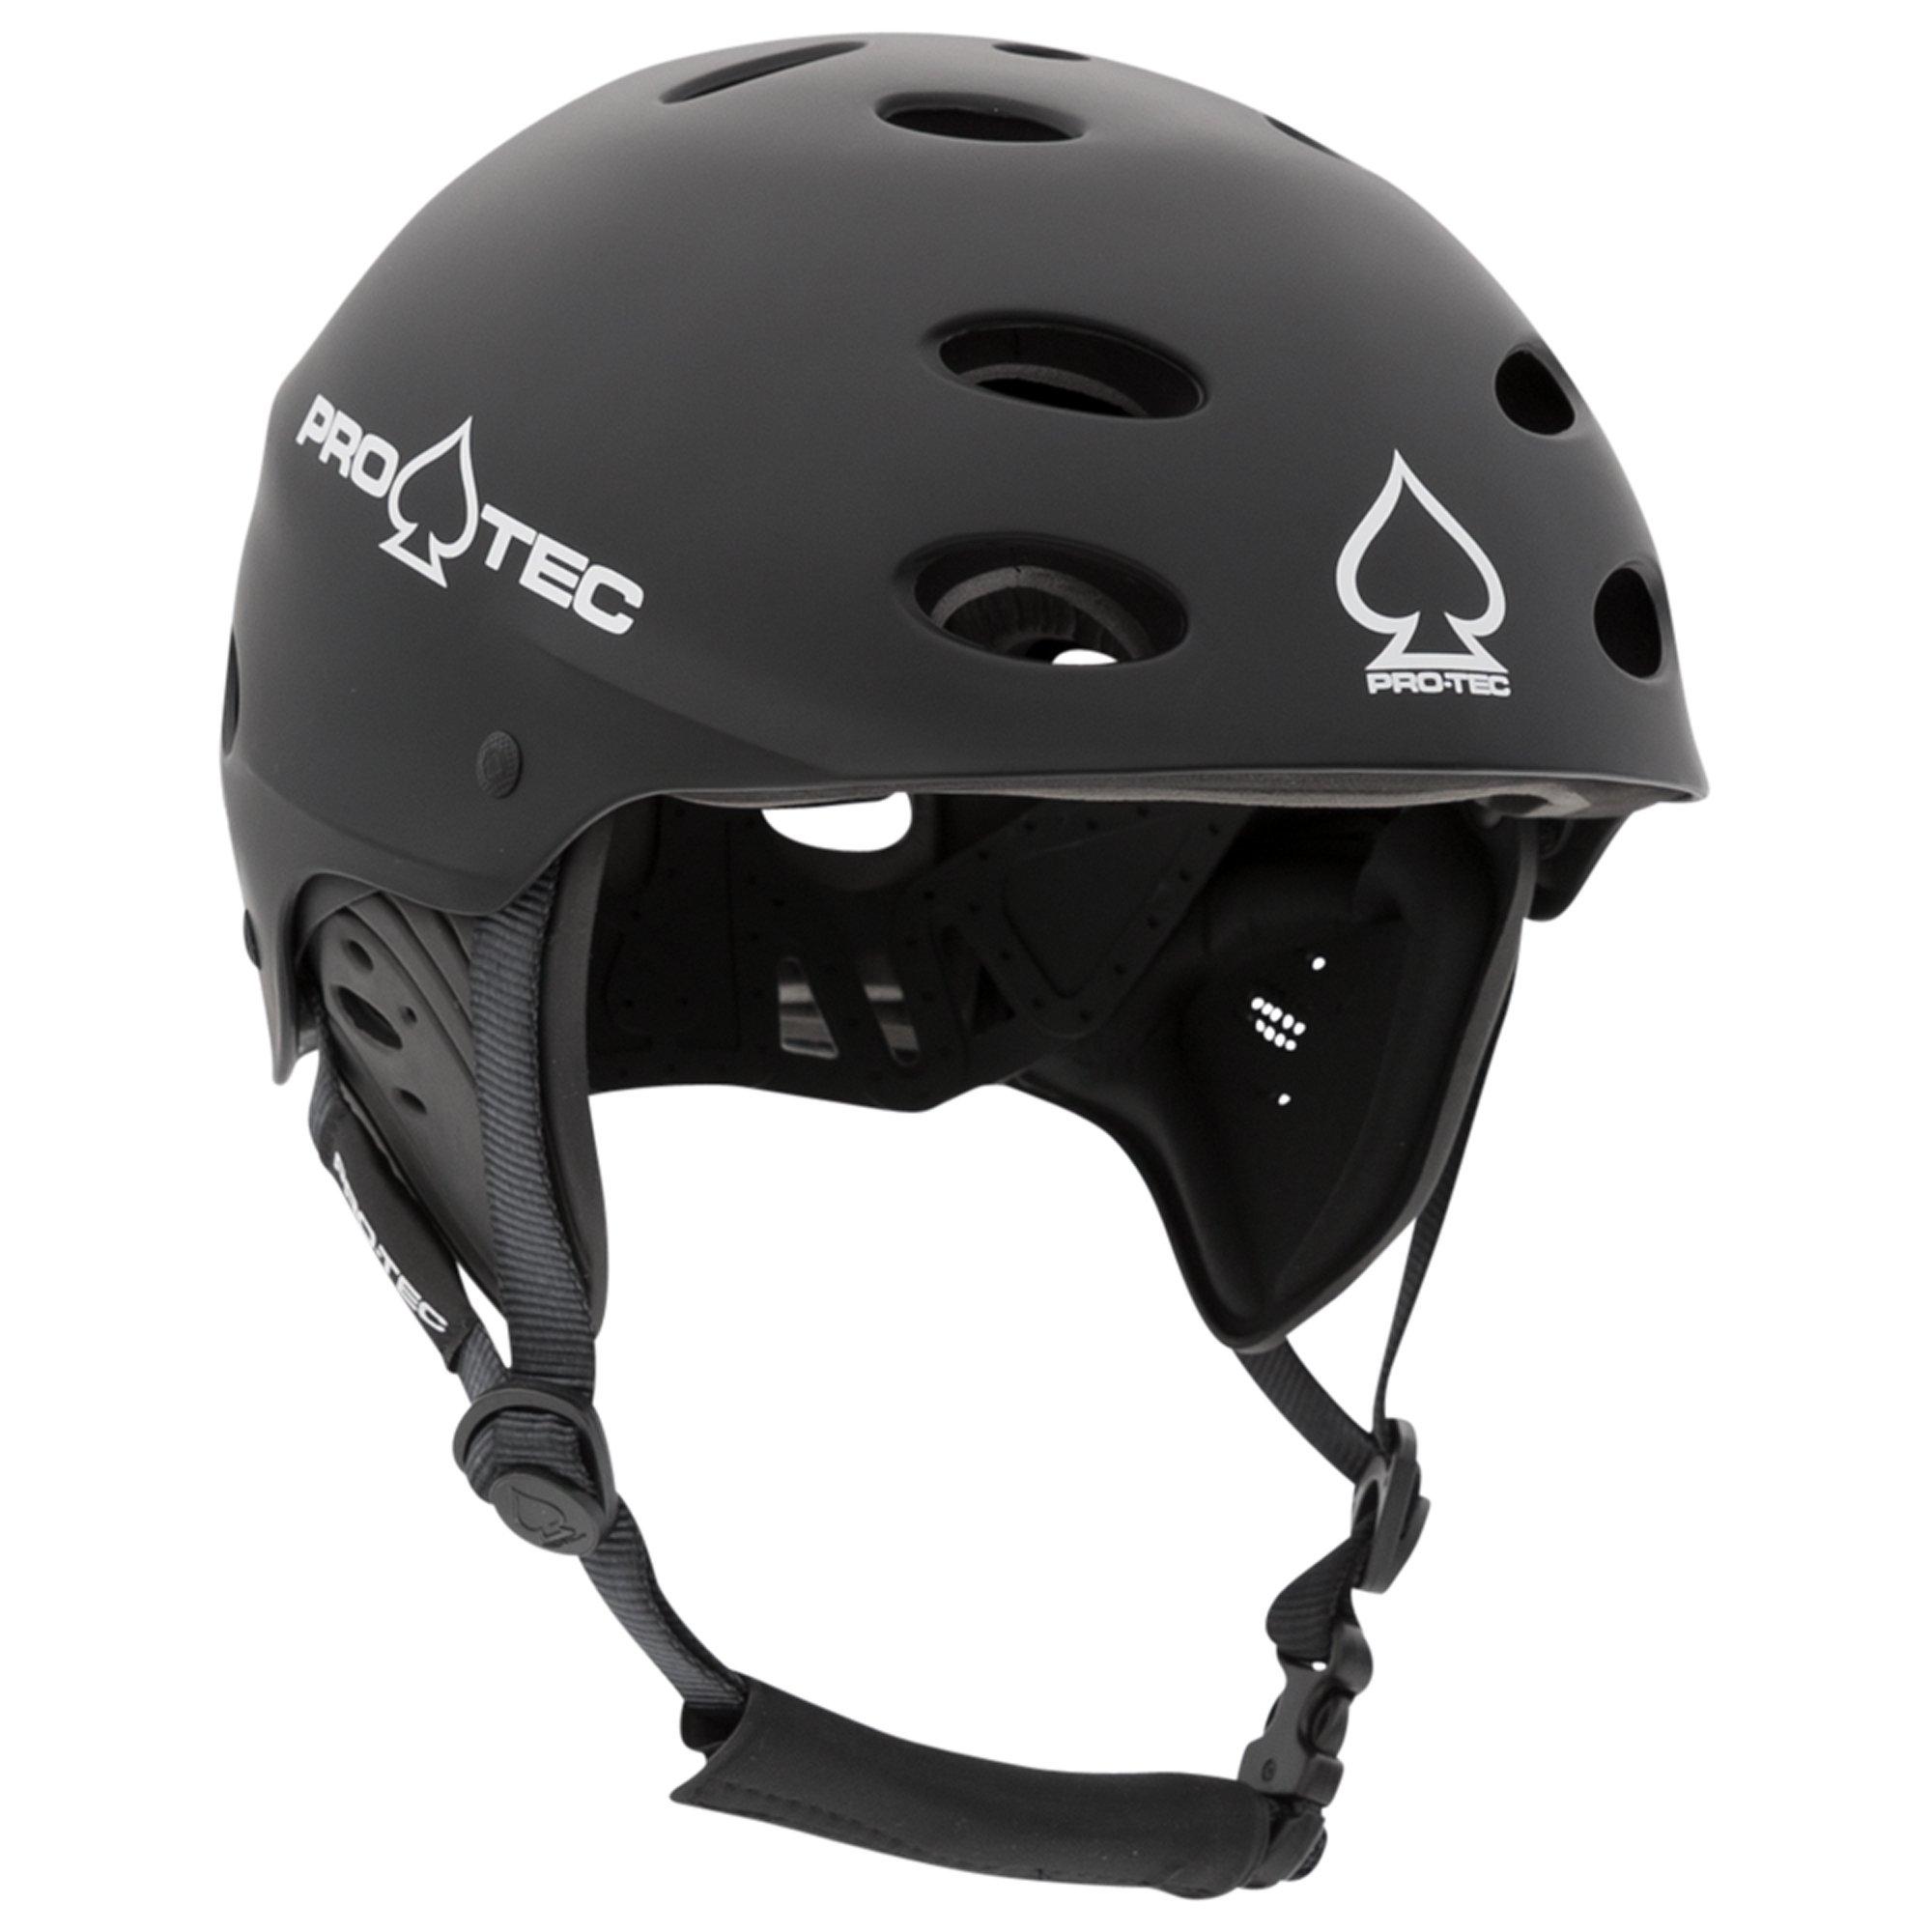 Pro-Tec - Ace Wake Helmet, Matte Black, M